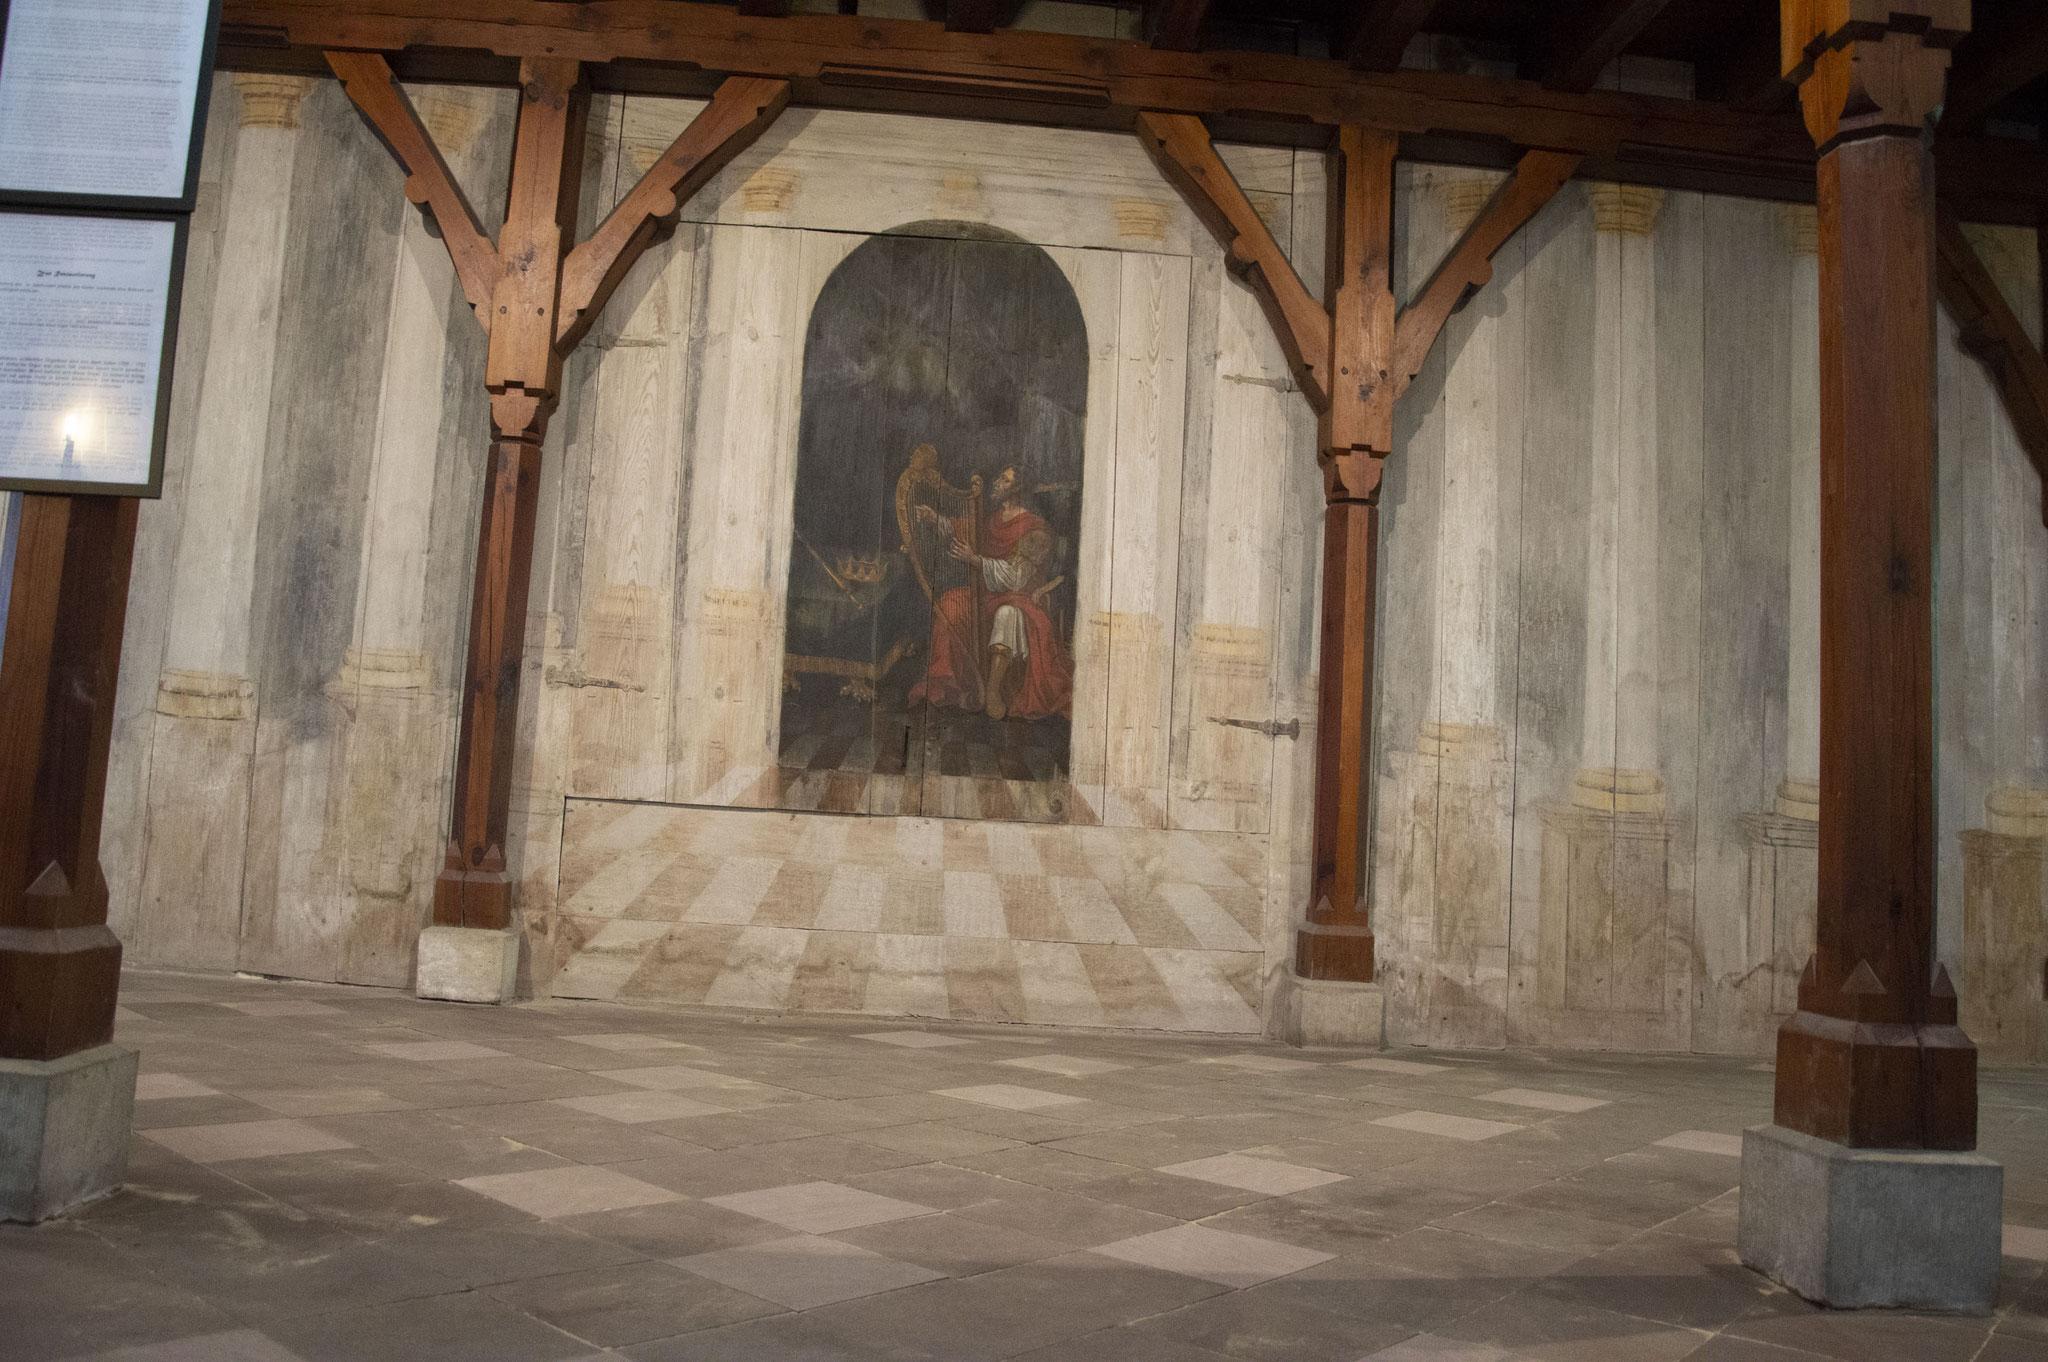 Pflasterarbeiten, Klosterkirche St. Marien, Kloster Zinna